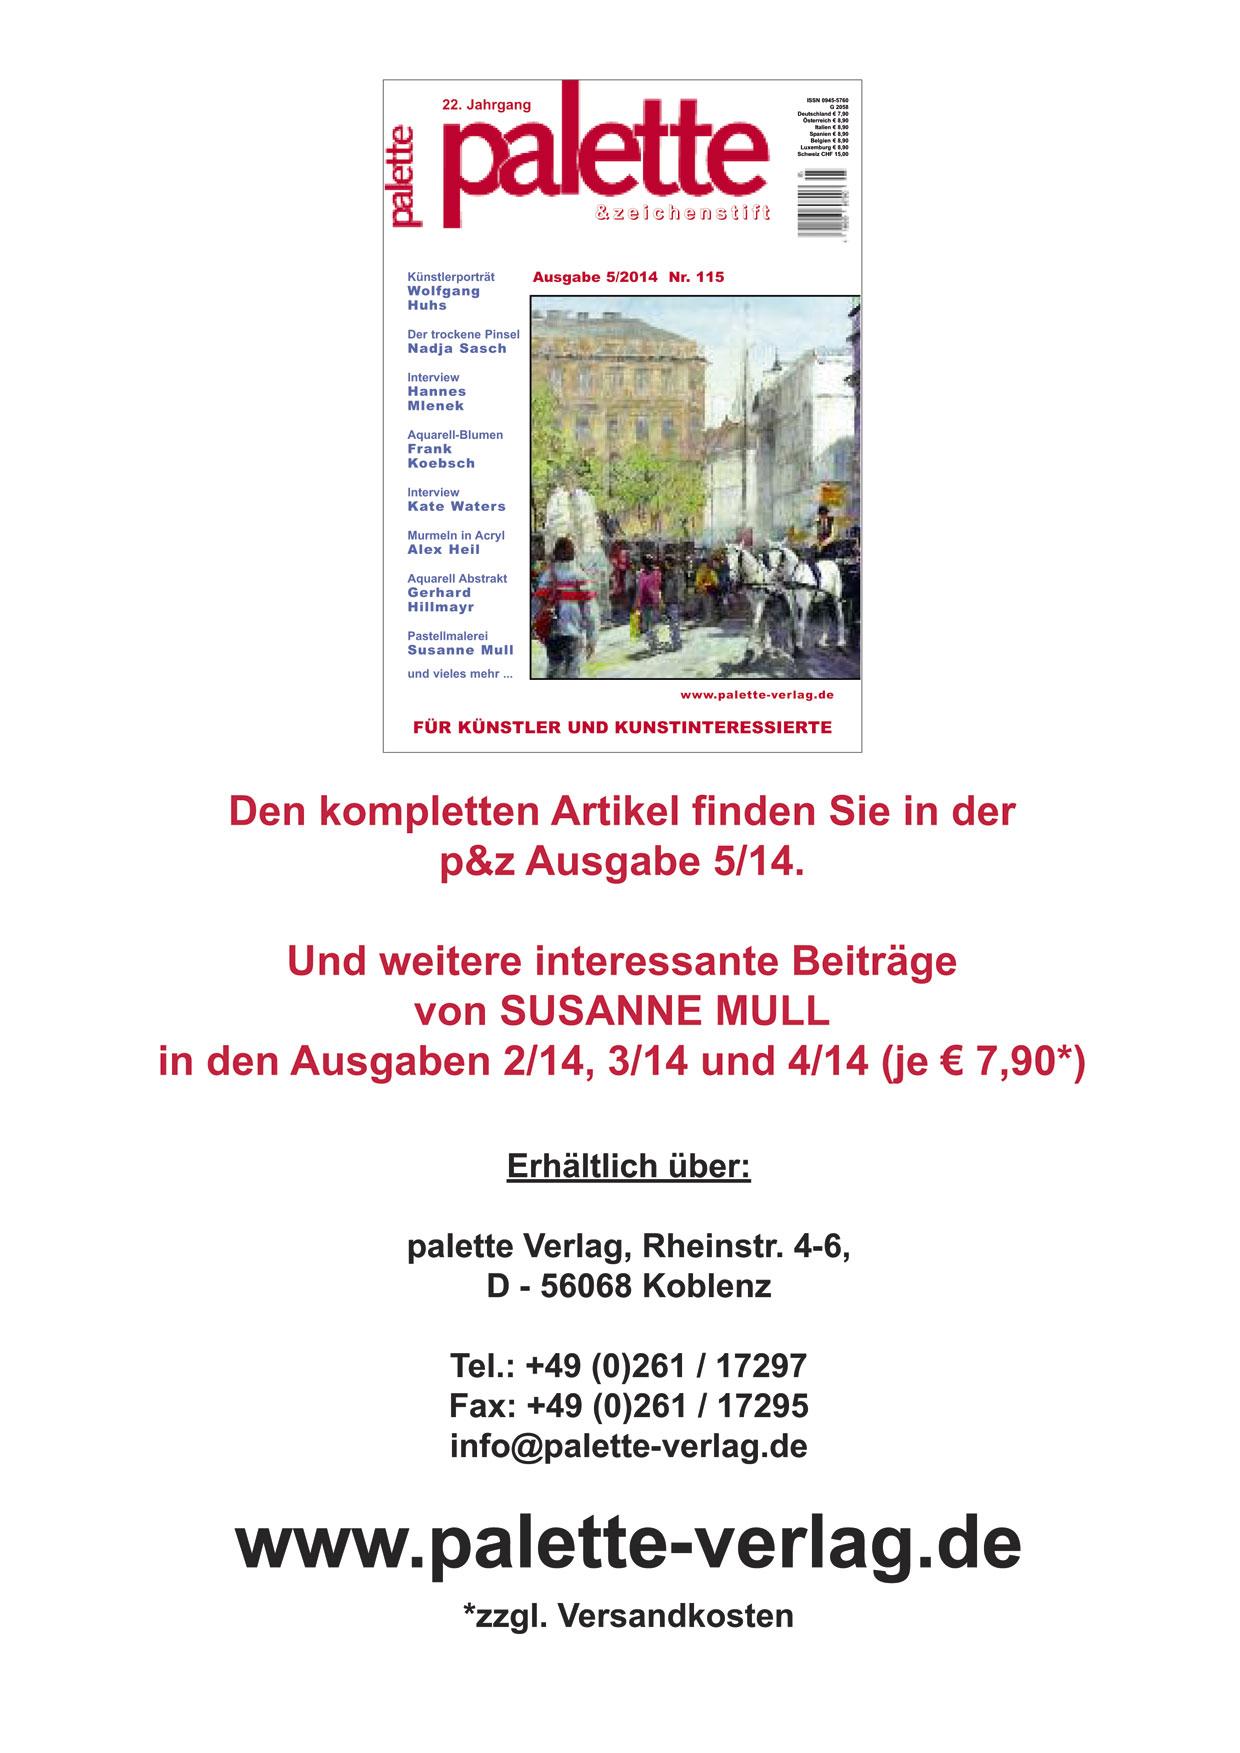 Susanne-Mull_5_2014-3